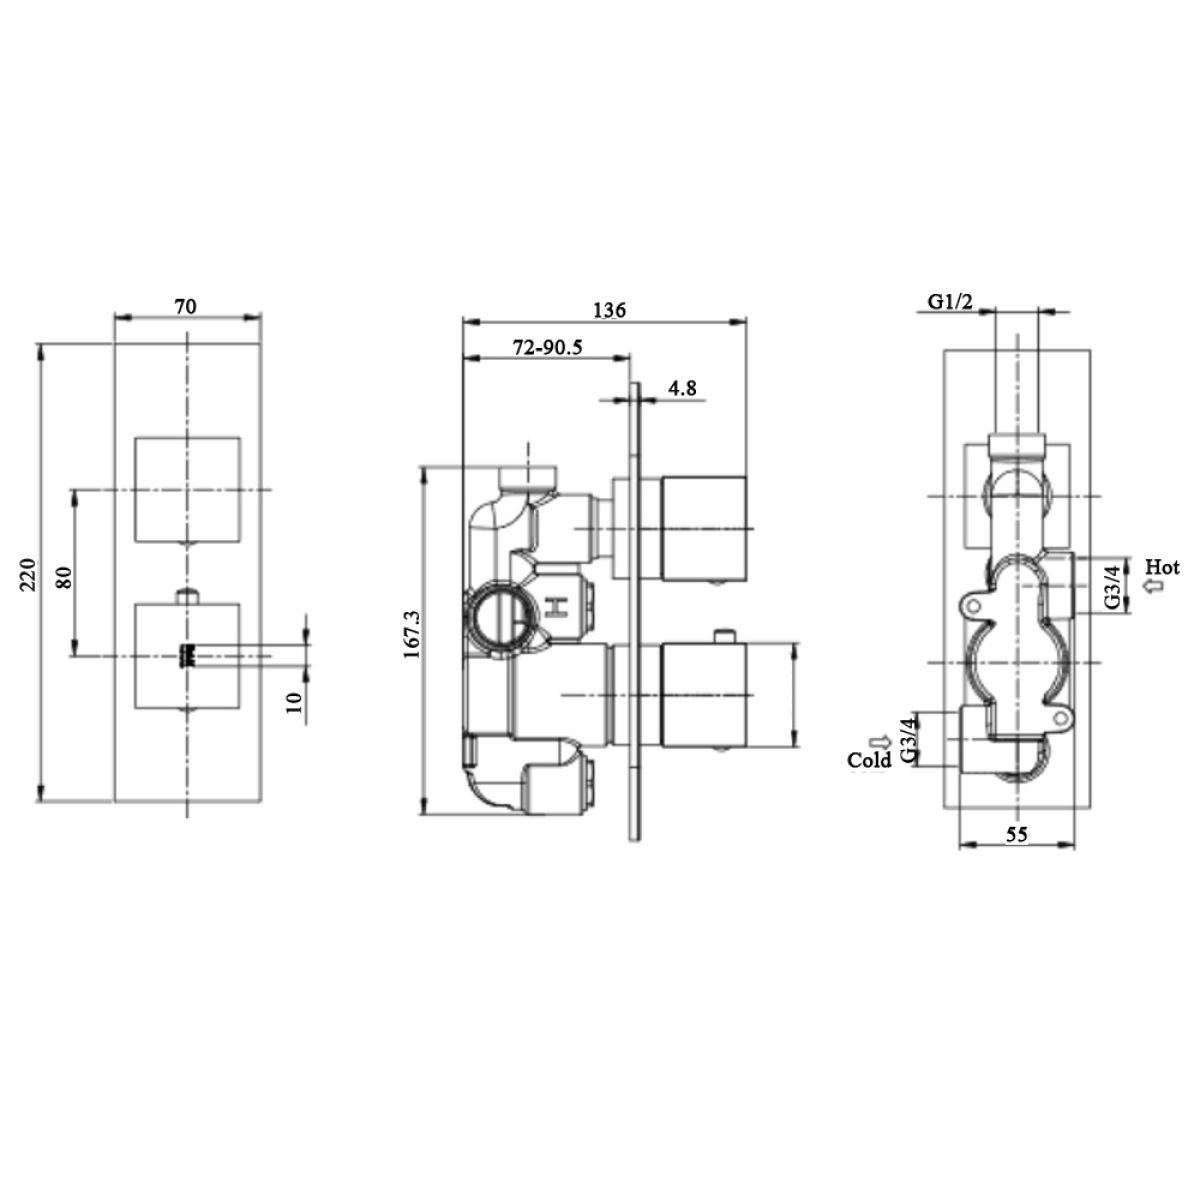 RAK Feeling Cappucino Square Single Outlet Thermostatic Shower Valve Measurements